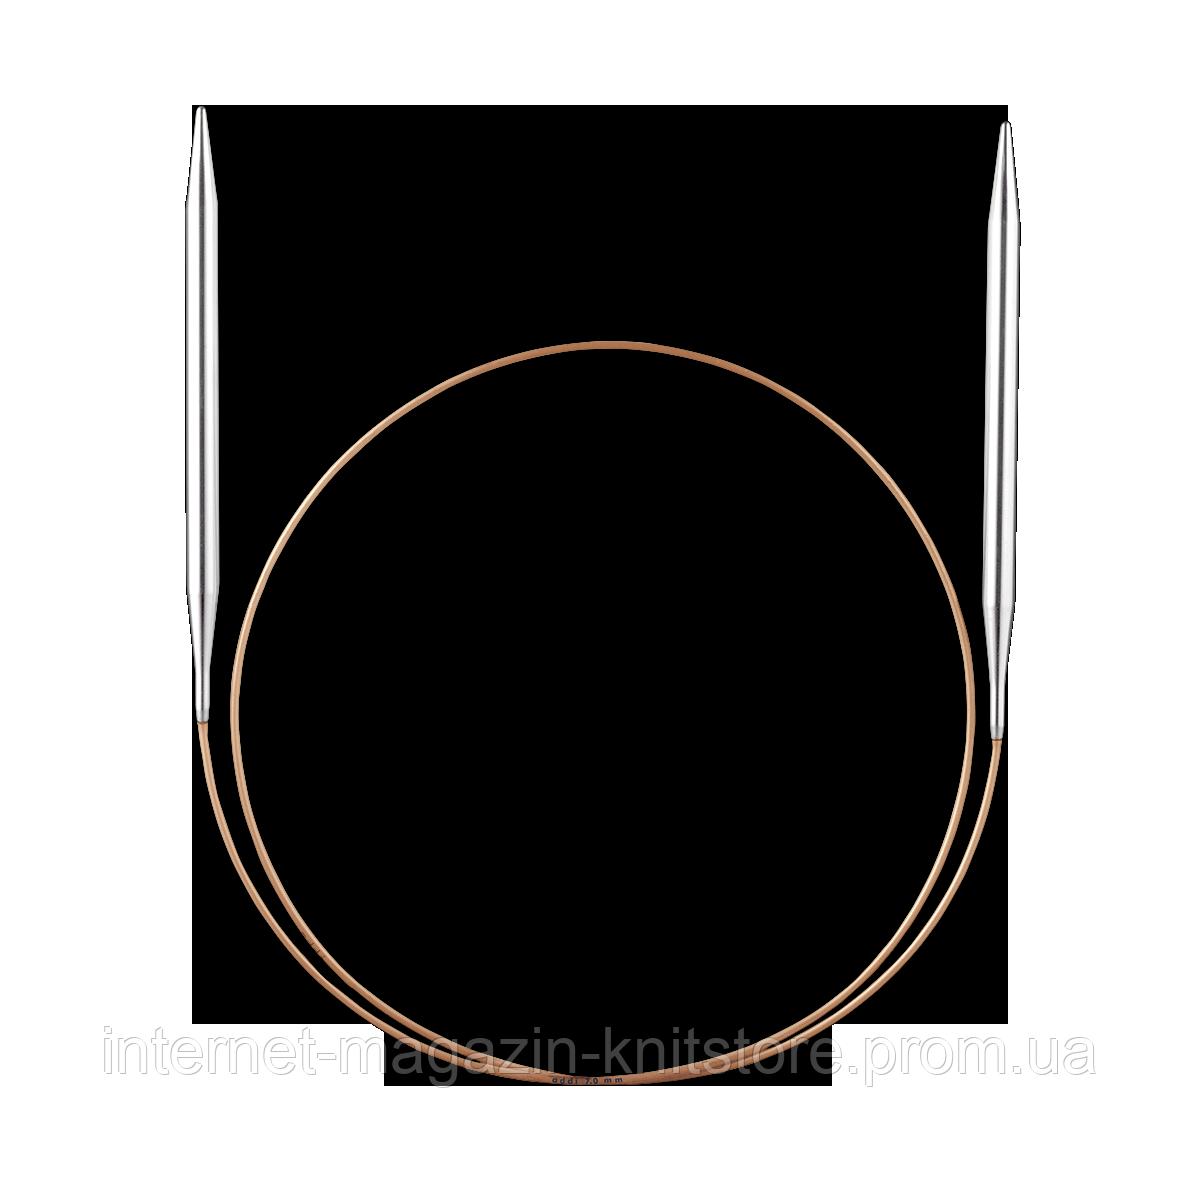 Спицы Addi круговые | 80 см | 4.5 мм